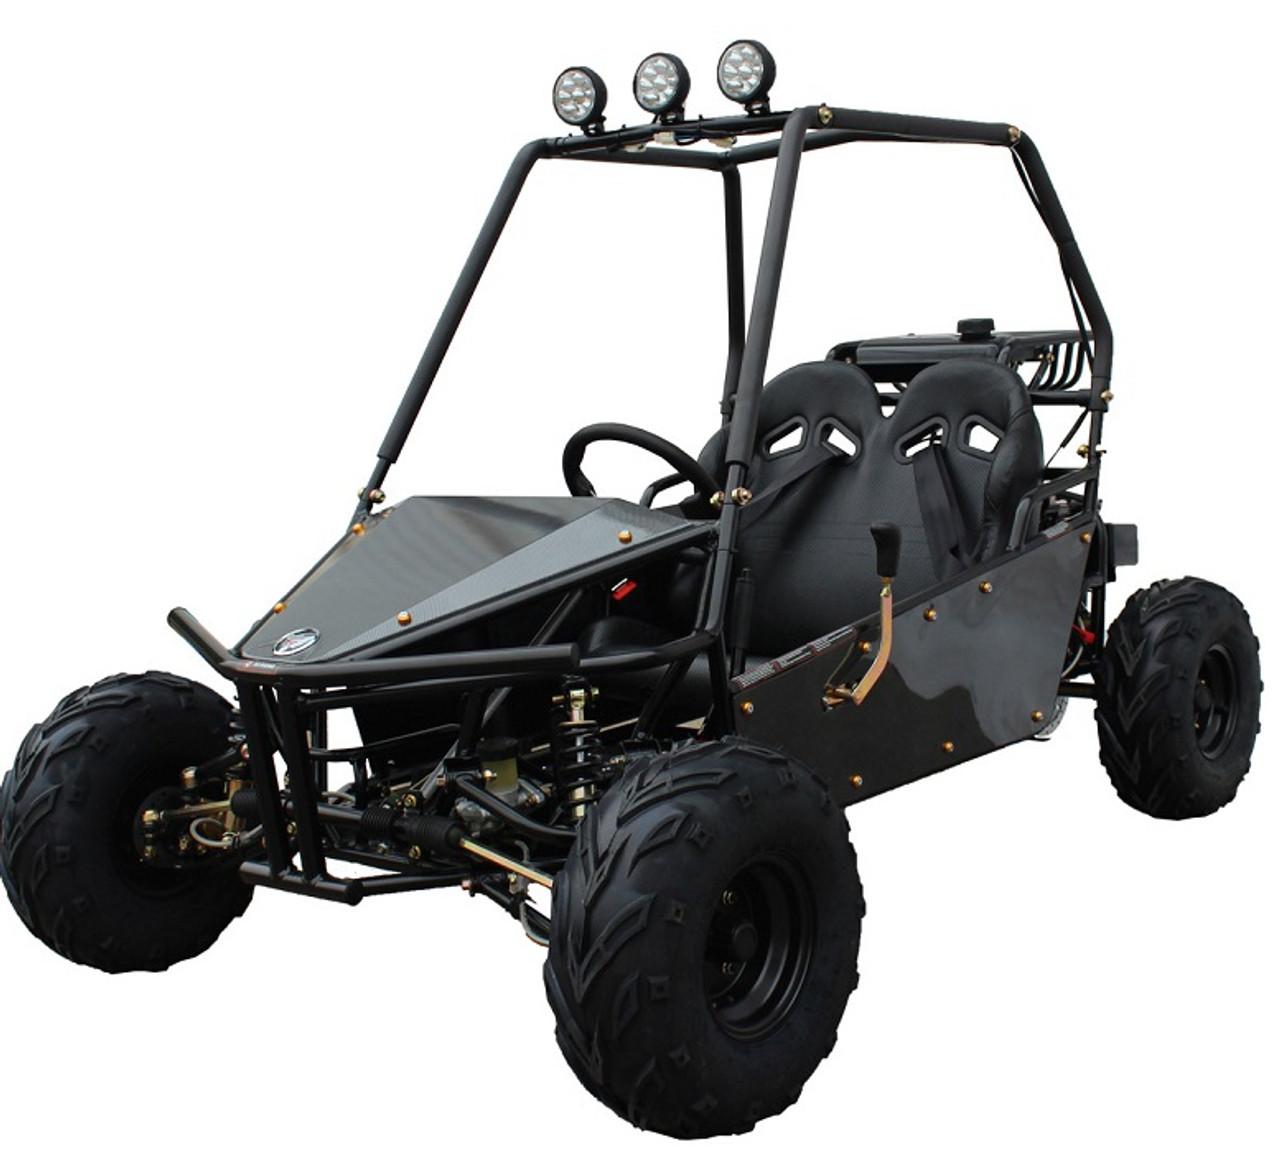 Massimo GKM-125 Go Kart, 4-Strock, Single Cylinder